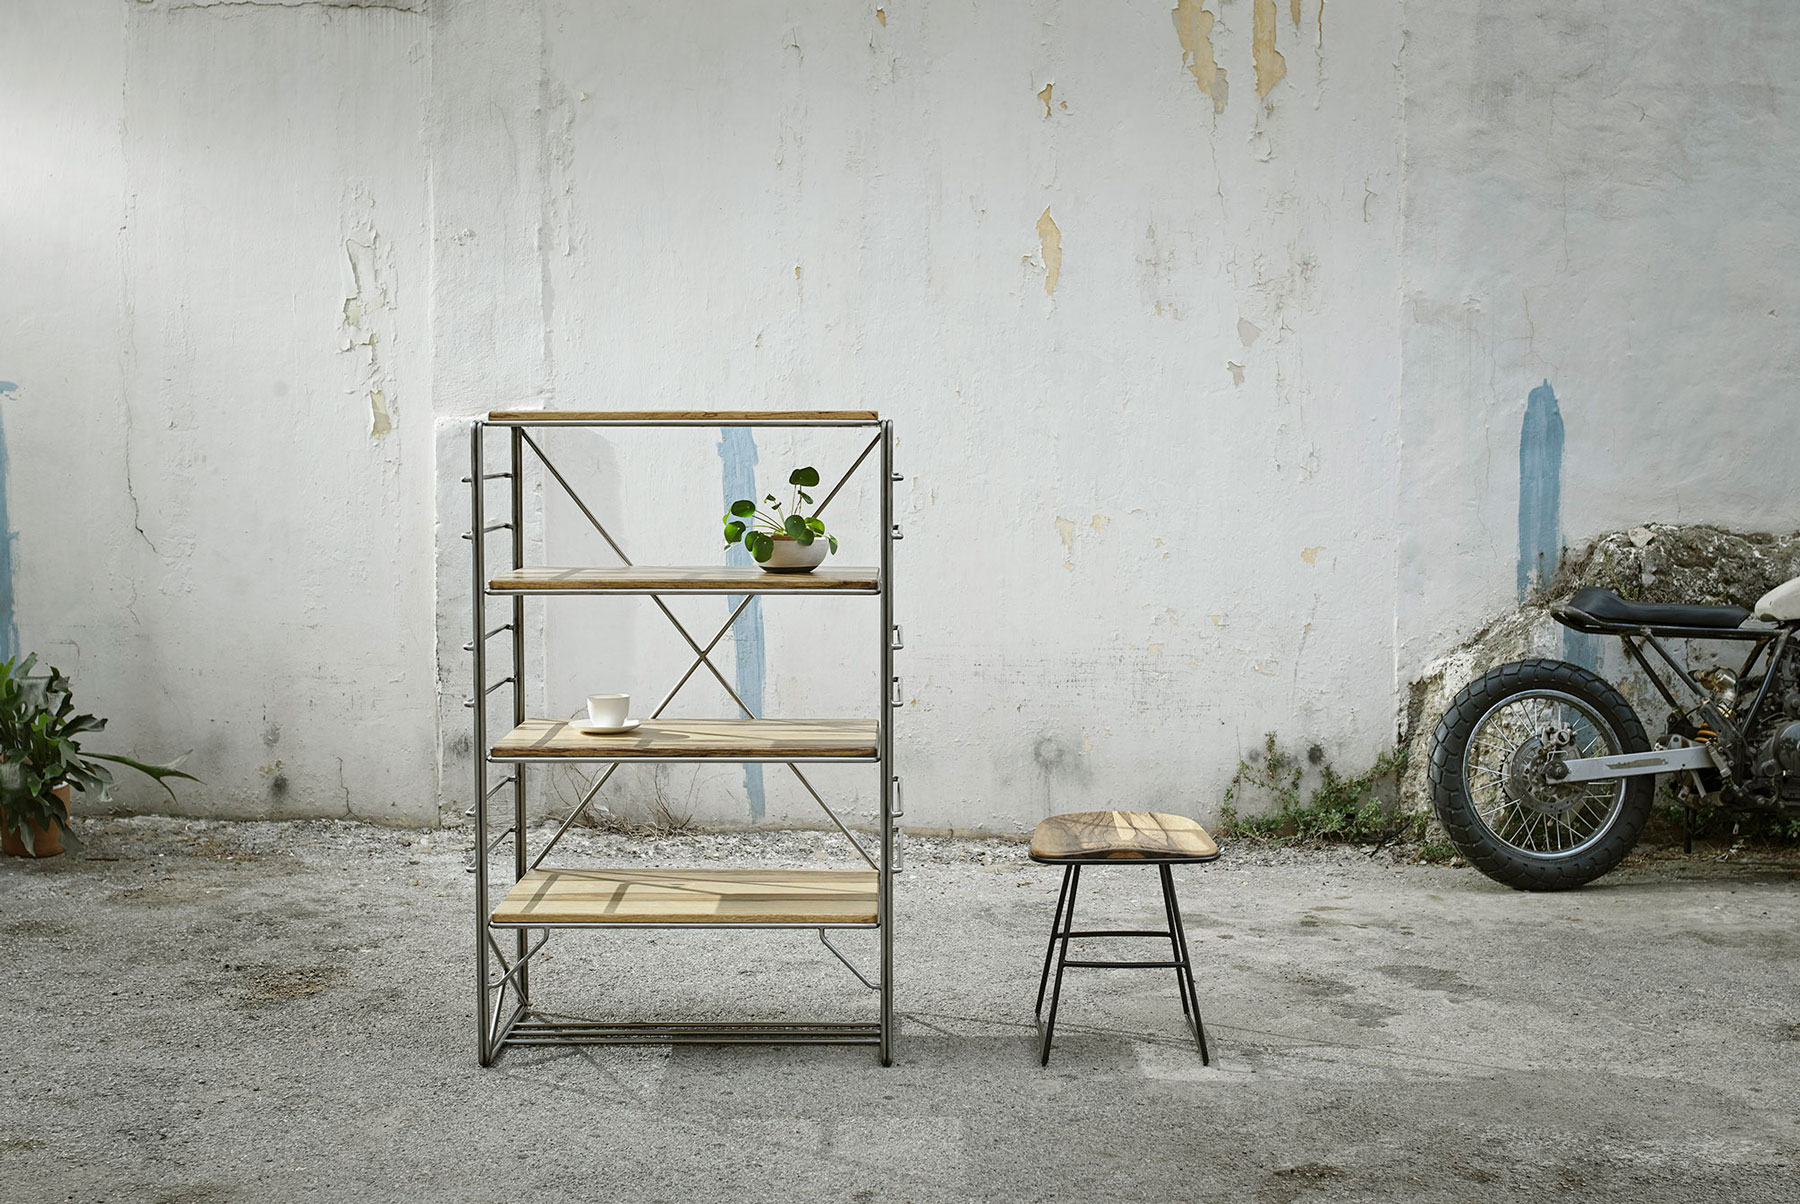 metal-and-wood-storage-wired-shelf-shelves.jpg